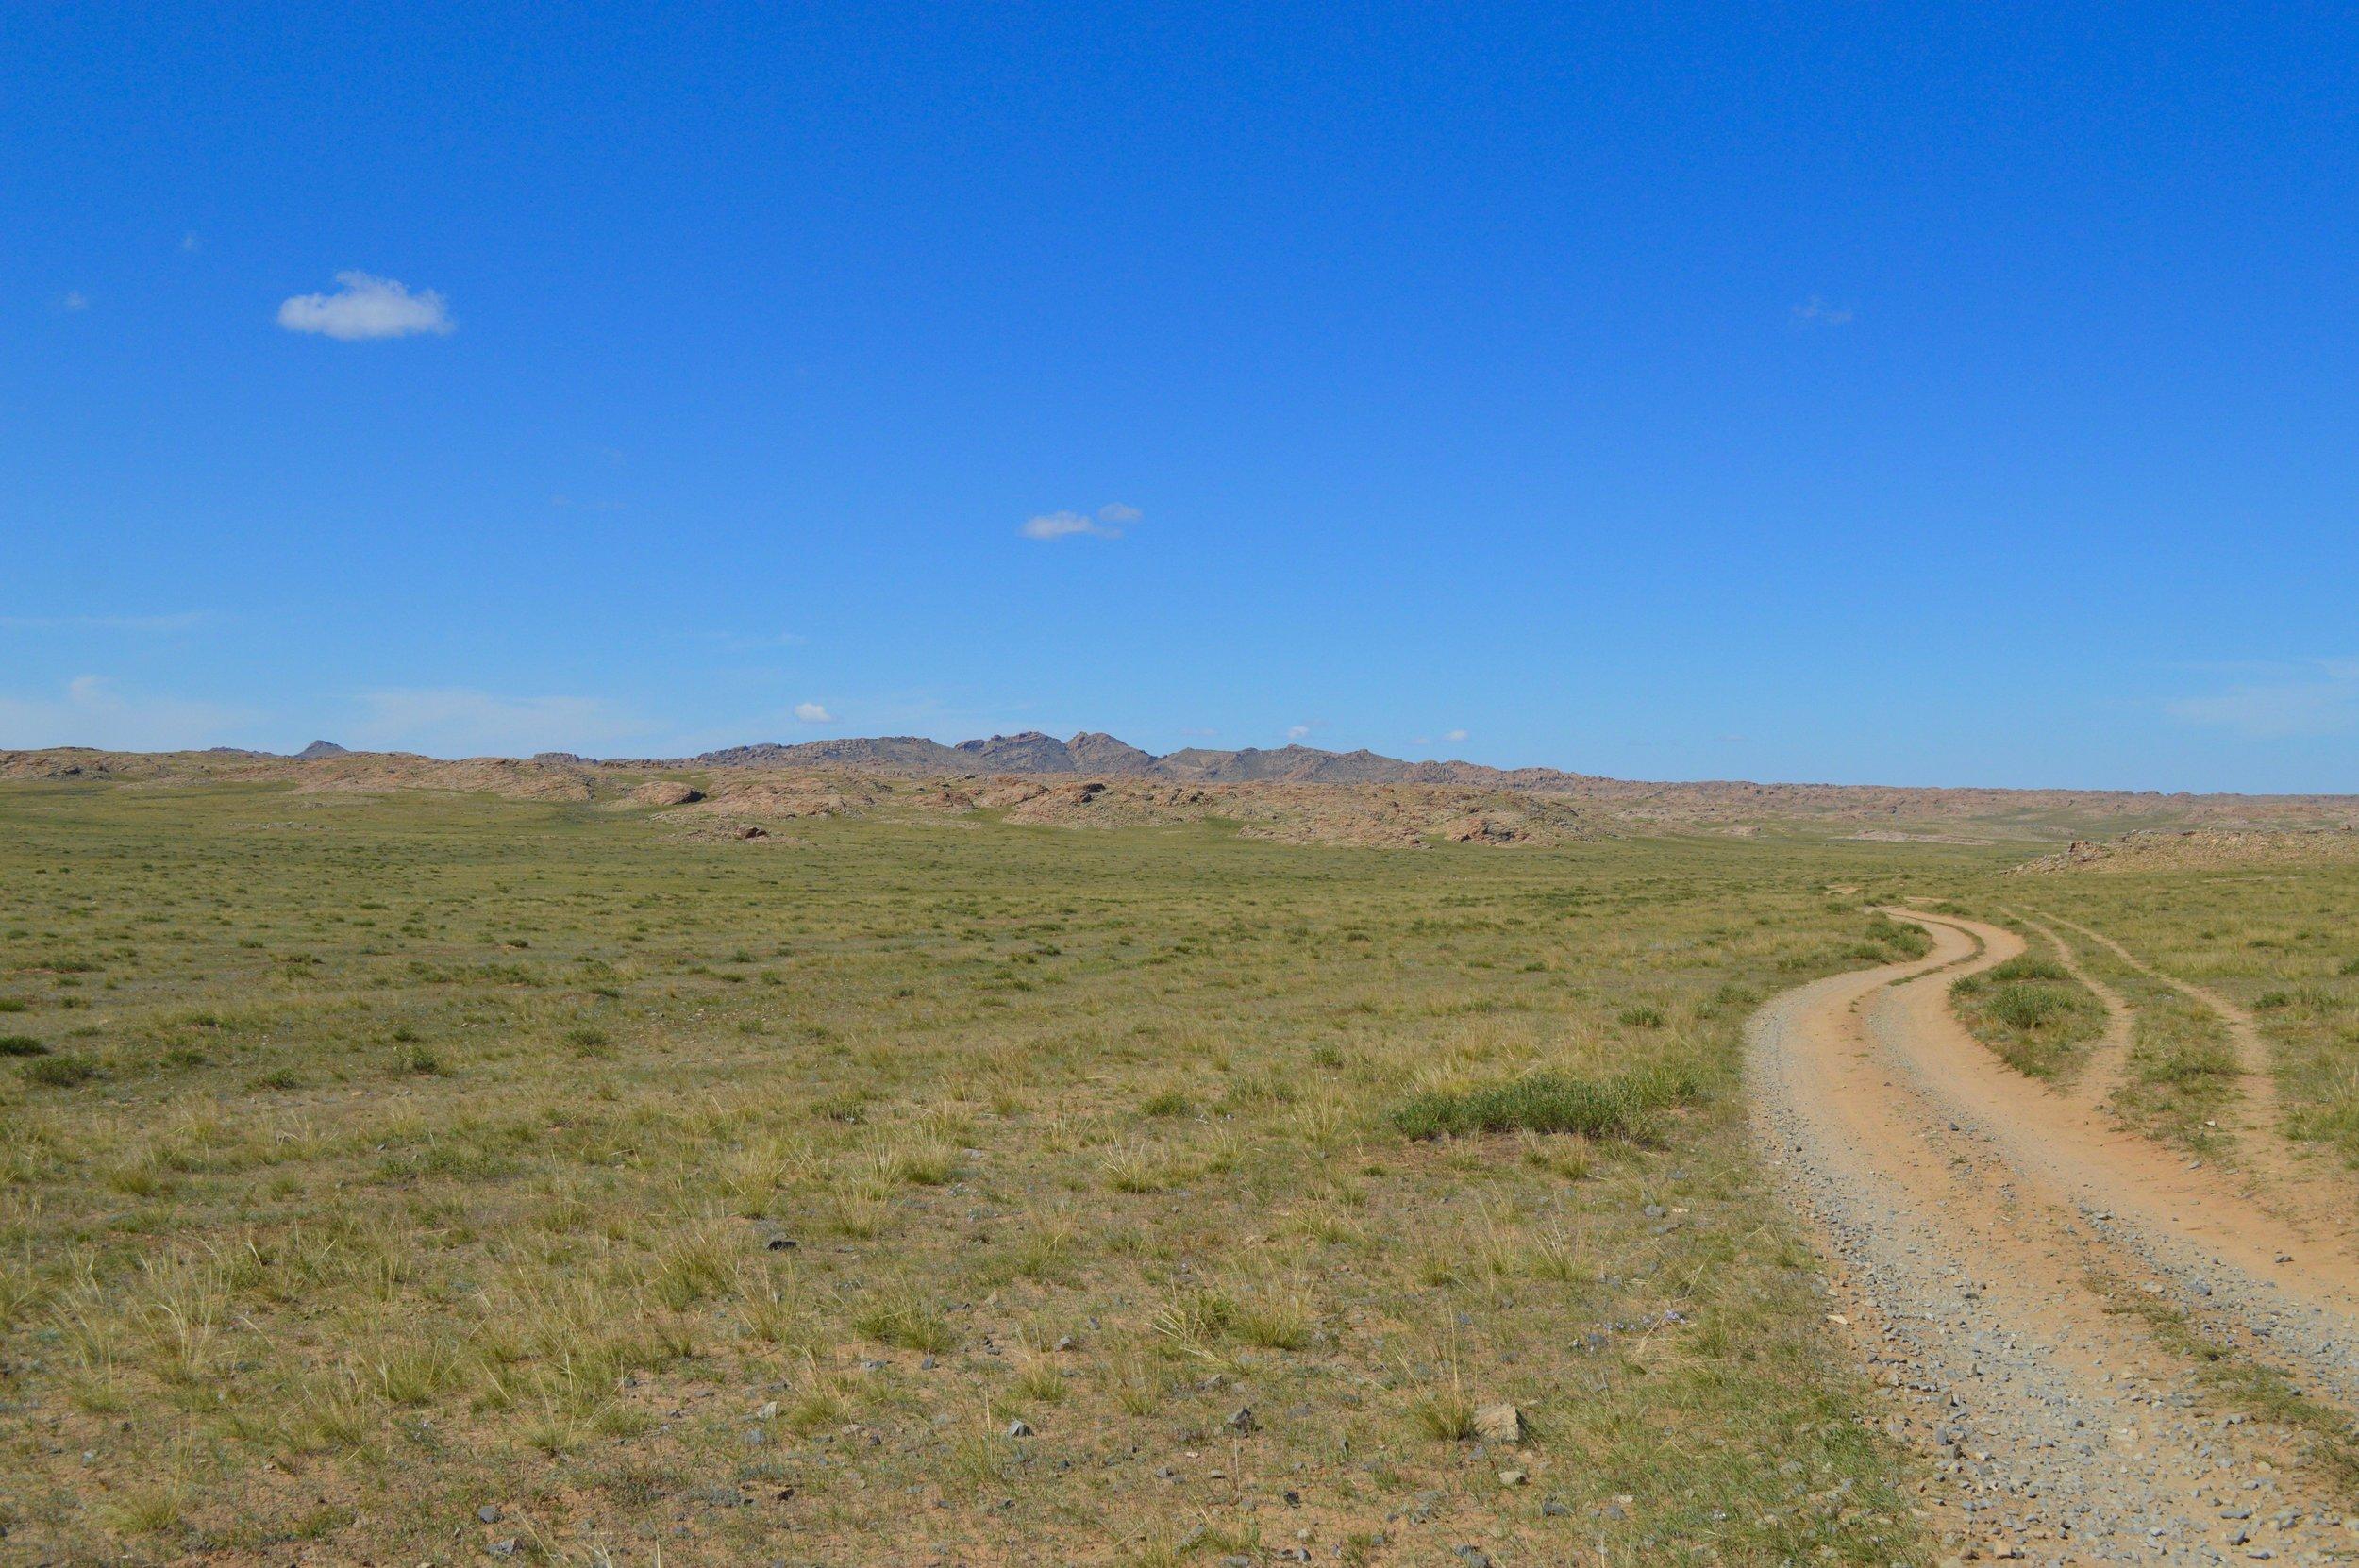 Winding dirt roads